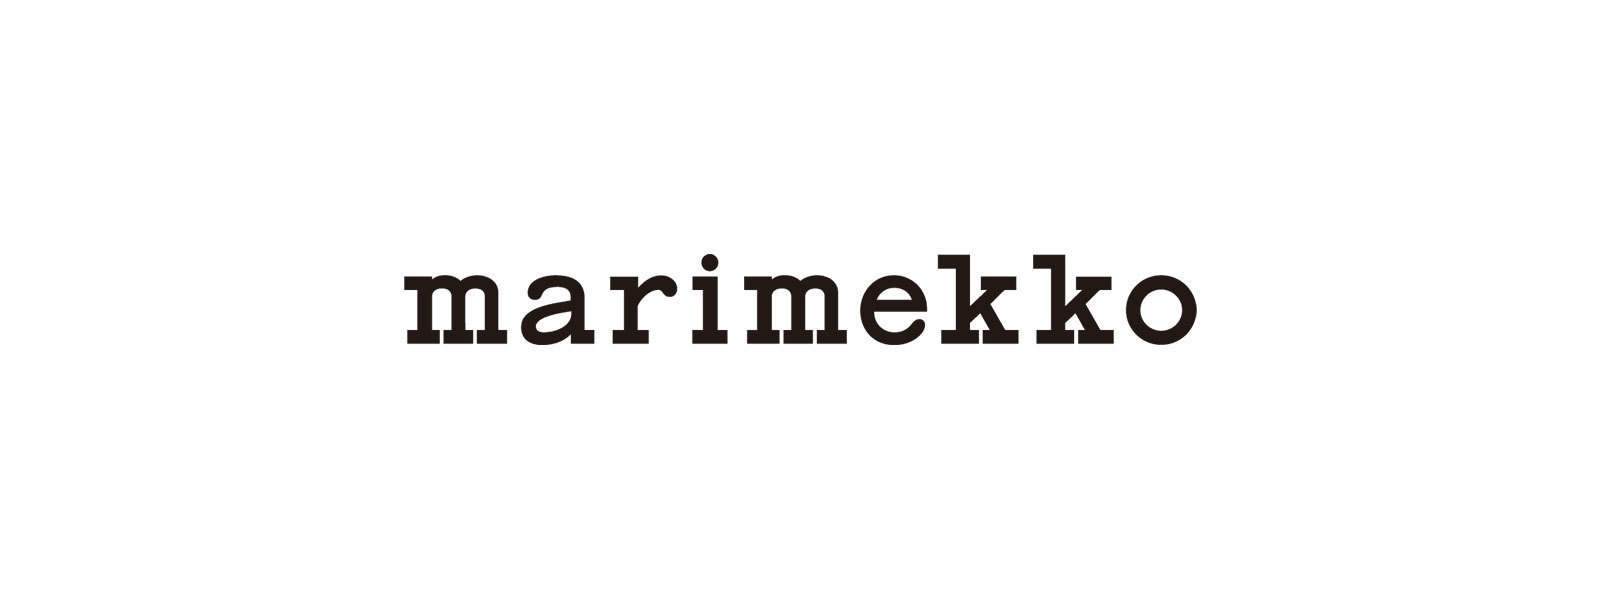 【marimekko(マリメッコ)】日本橋高島屋のカバー写真